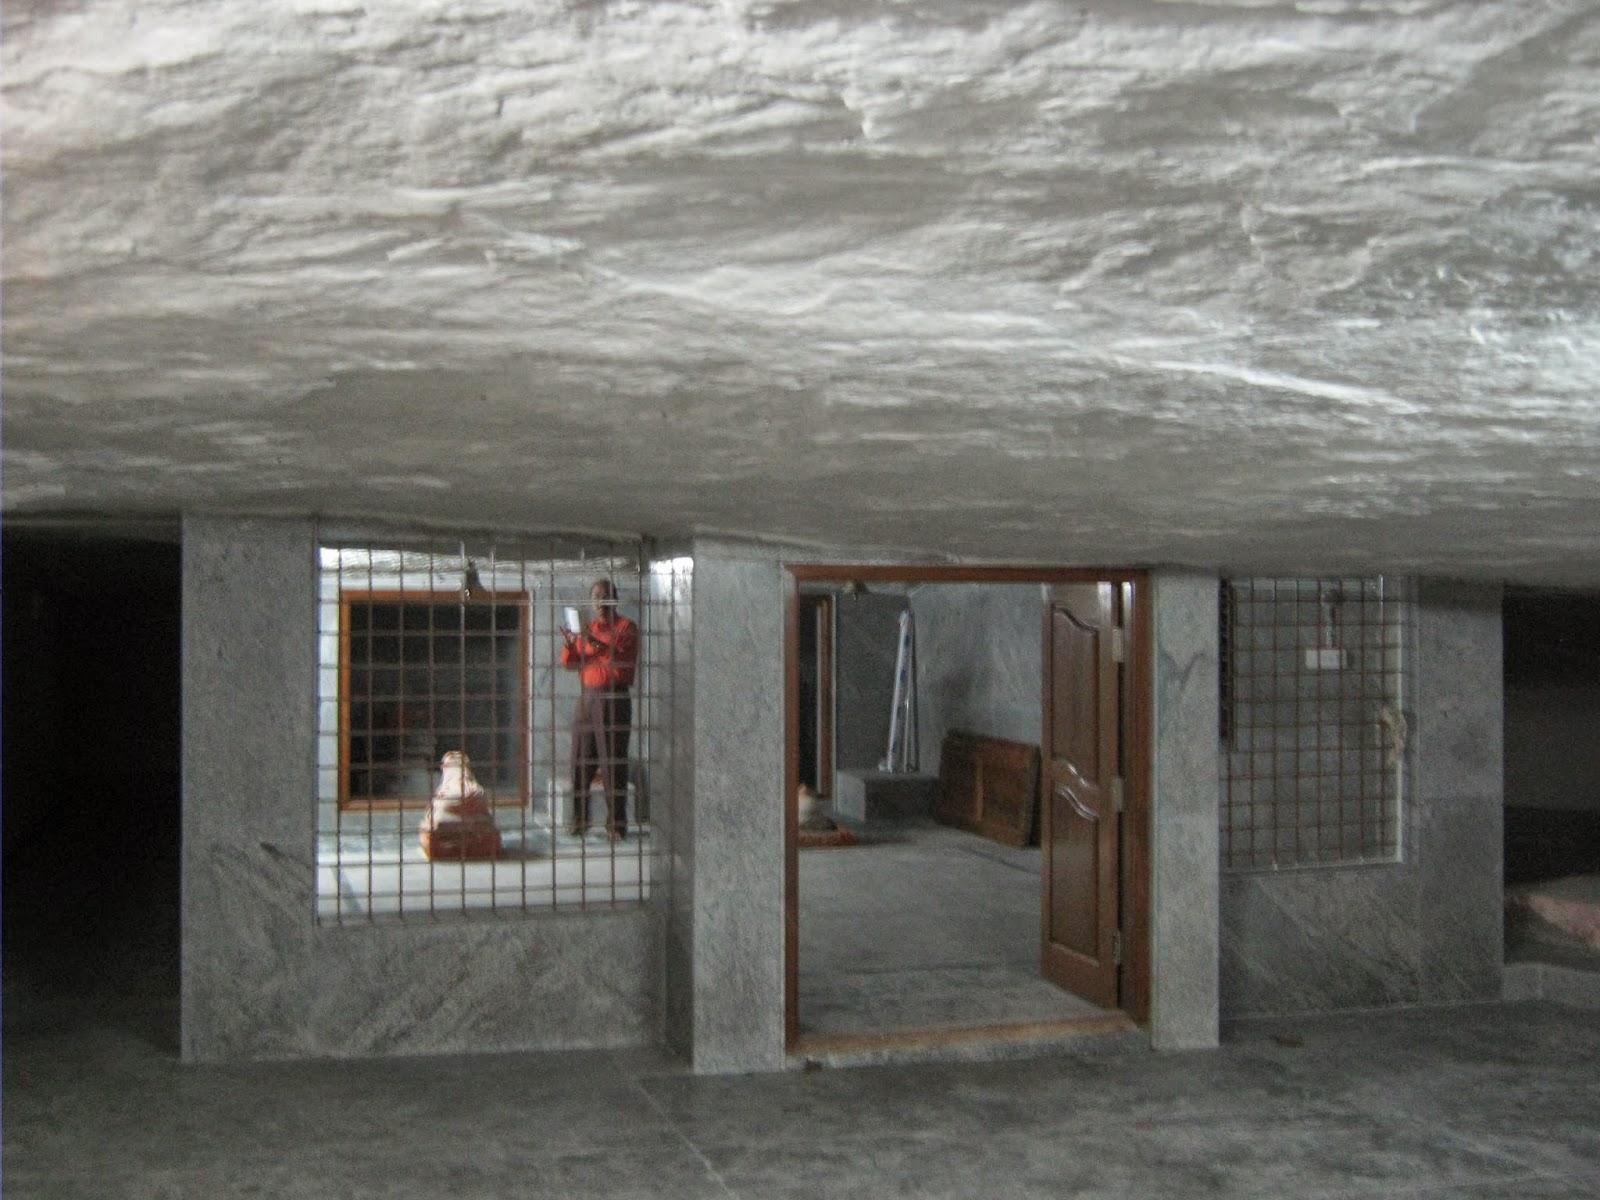 Eshwara temple in bangalore dating 4